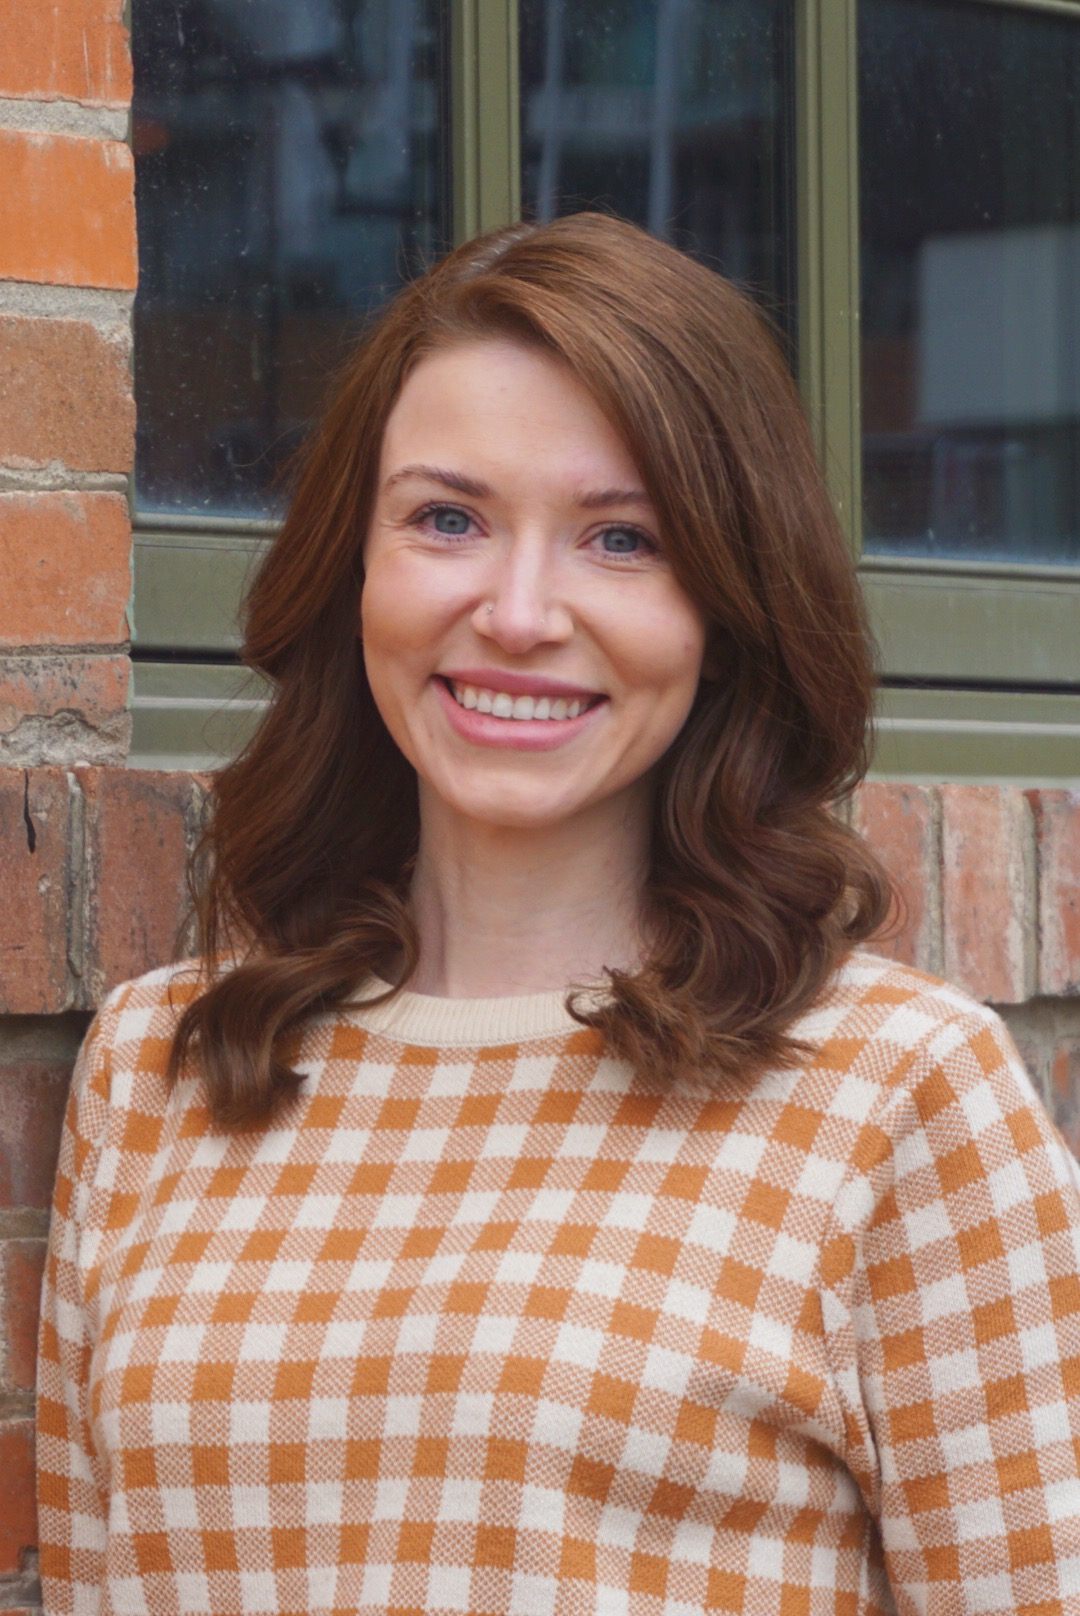 Kristy Archibald